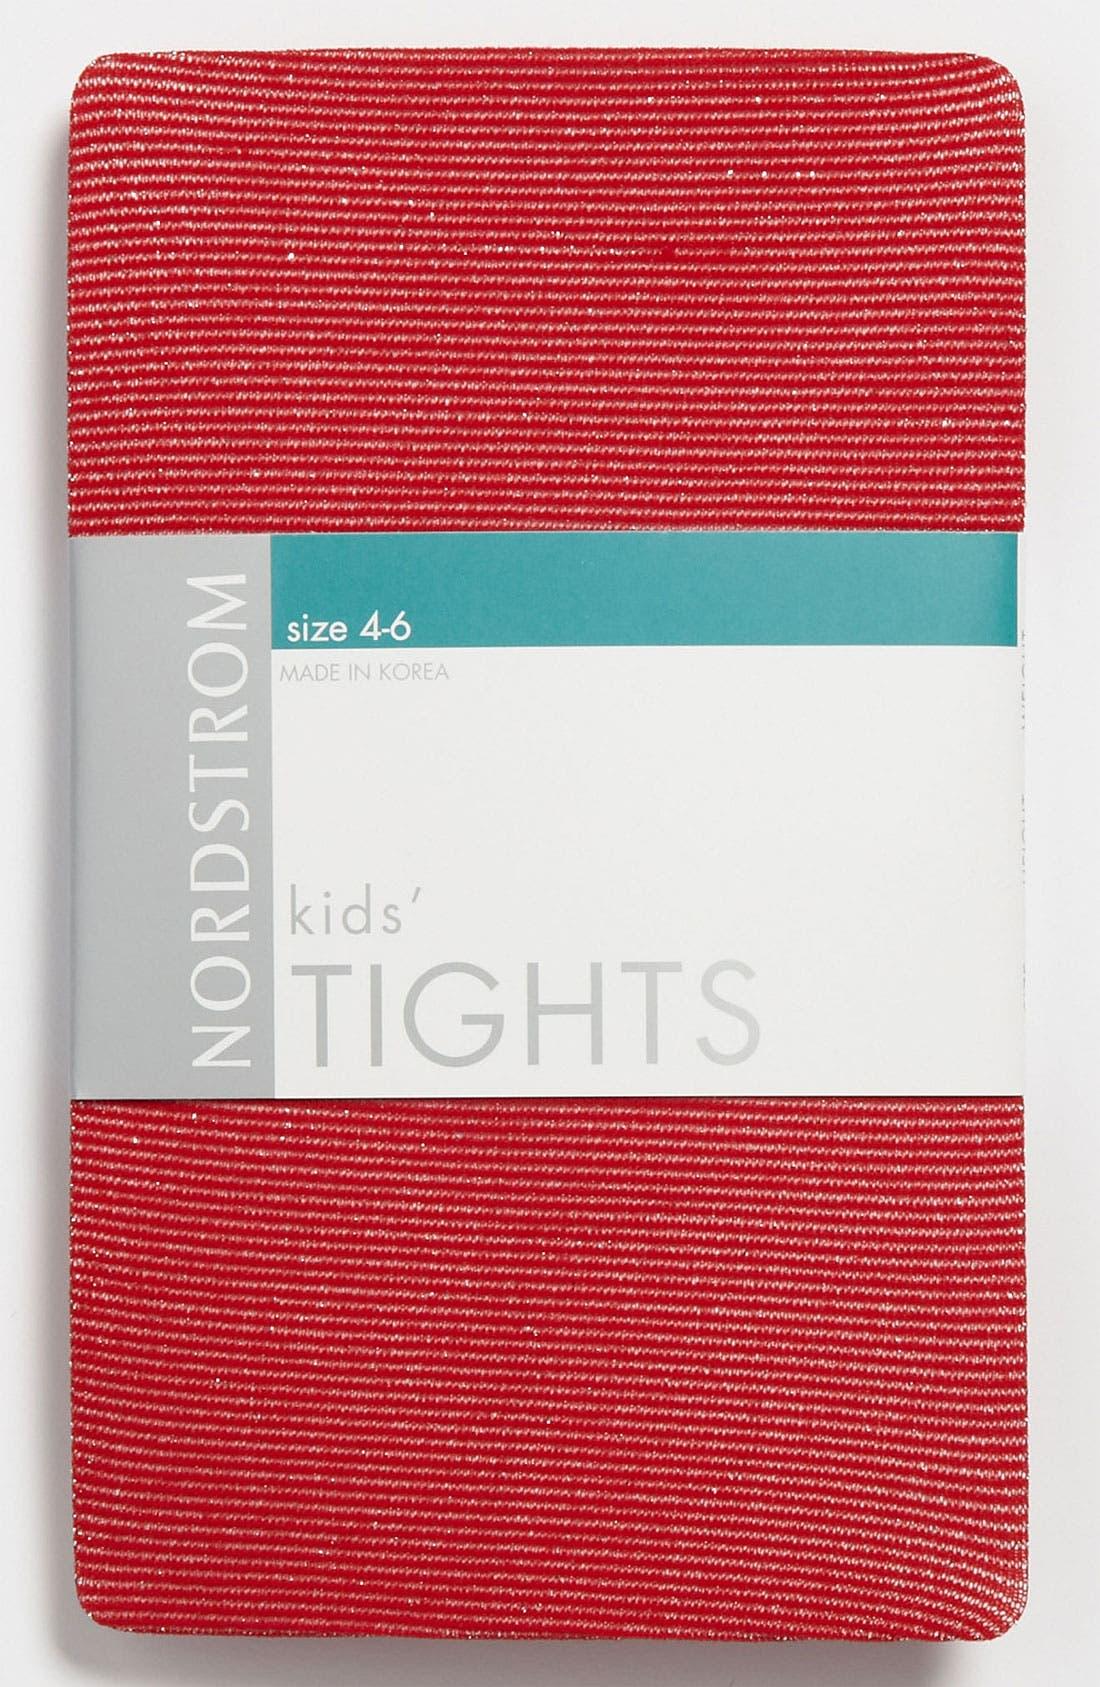 Alternate Image 1 Selected - Nordstrom 'Sparkle Stripe' Tights (Girls)